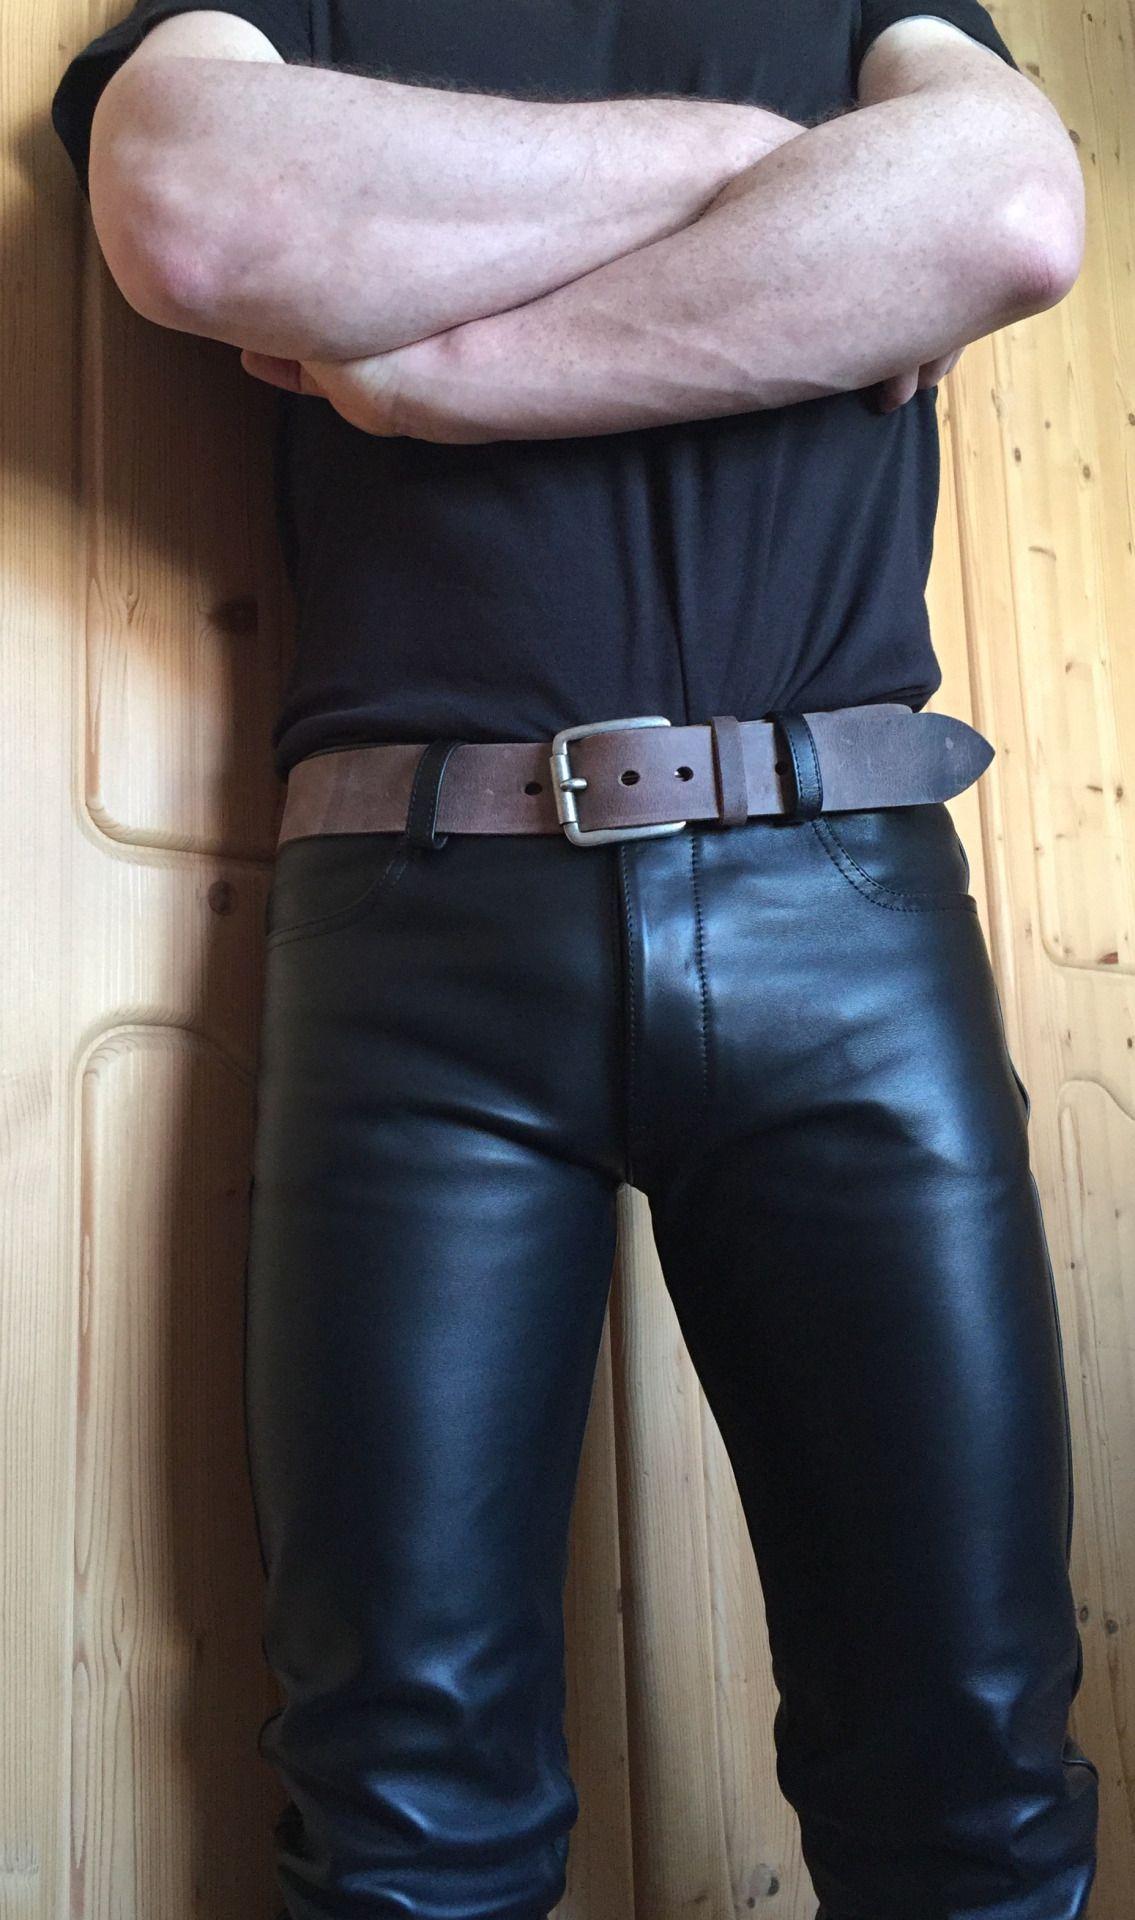 Fetish men leather boots